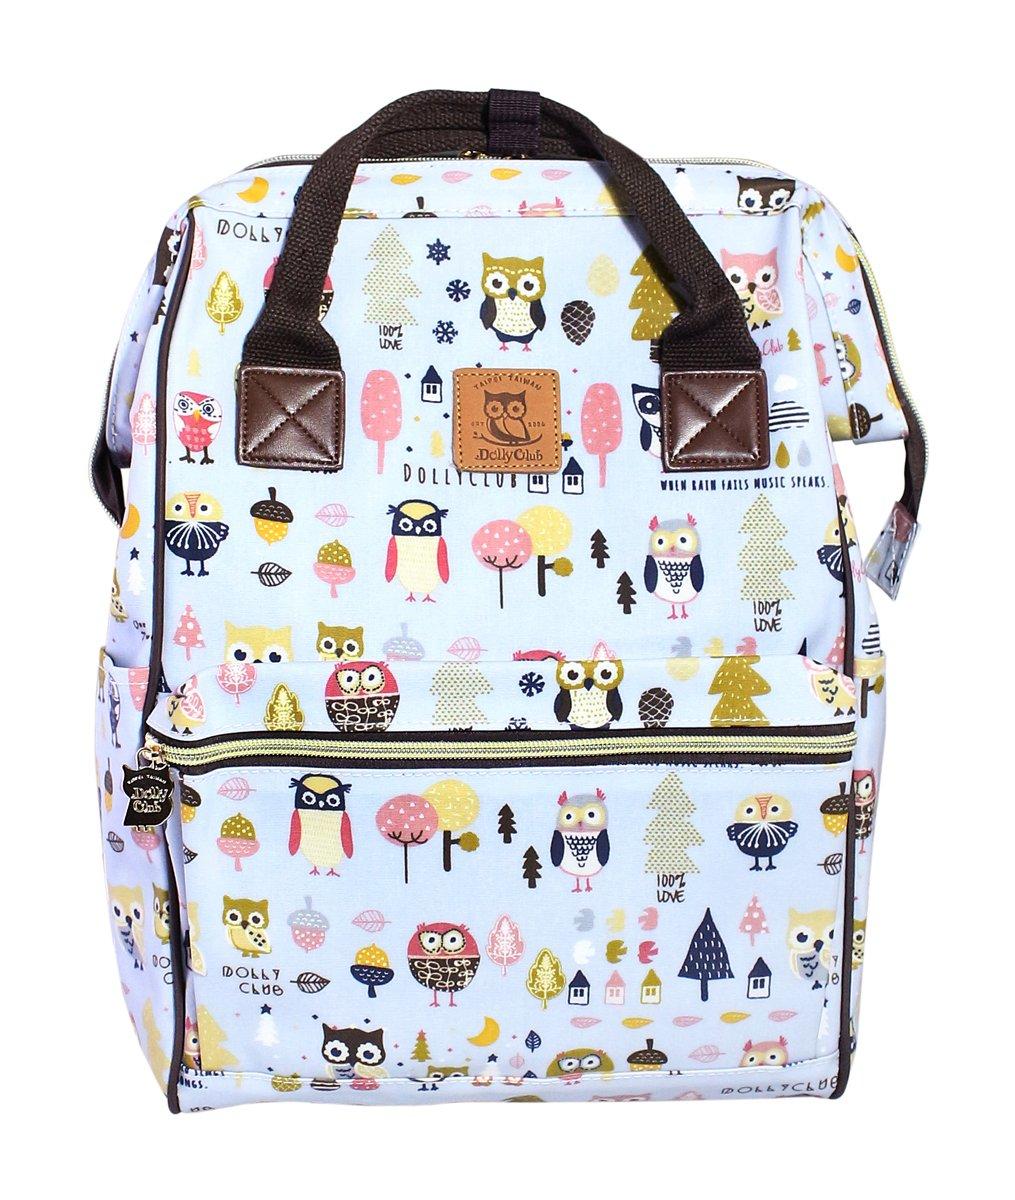 Versatile Travel Storage Organizer School Bag Campus Rucksack 10.6x6.3x15.7 Adorable Owl Family Pattern Design DollyClub Water Repellent PVC Backpack for Women Girls